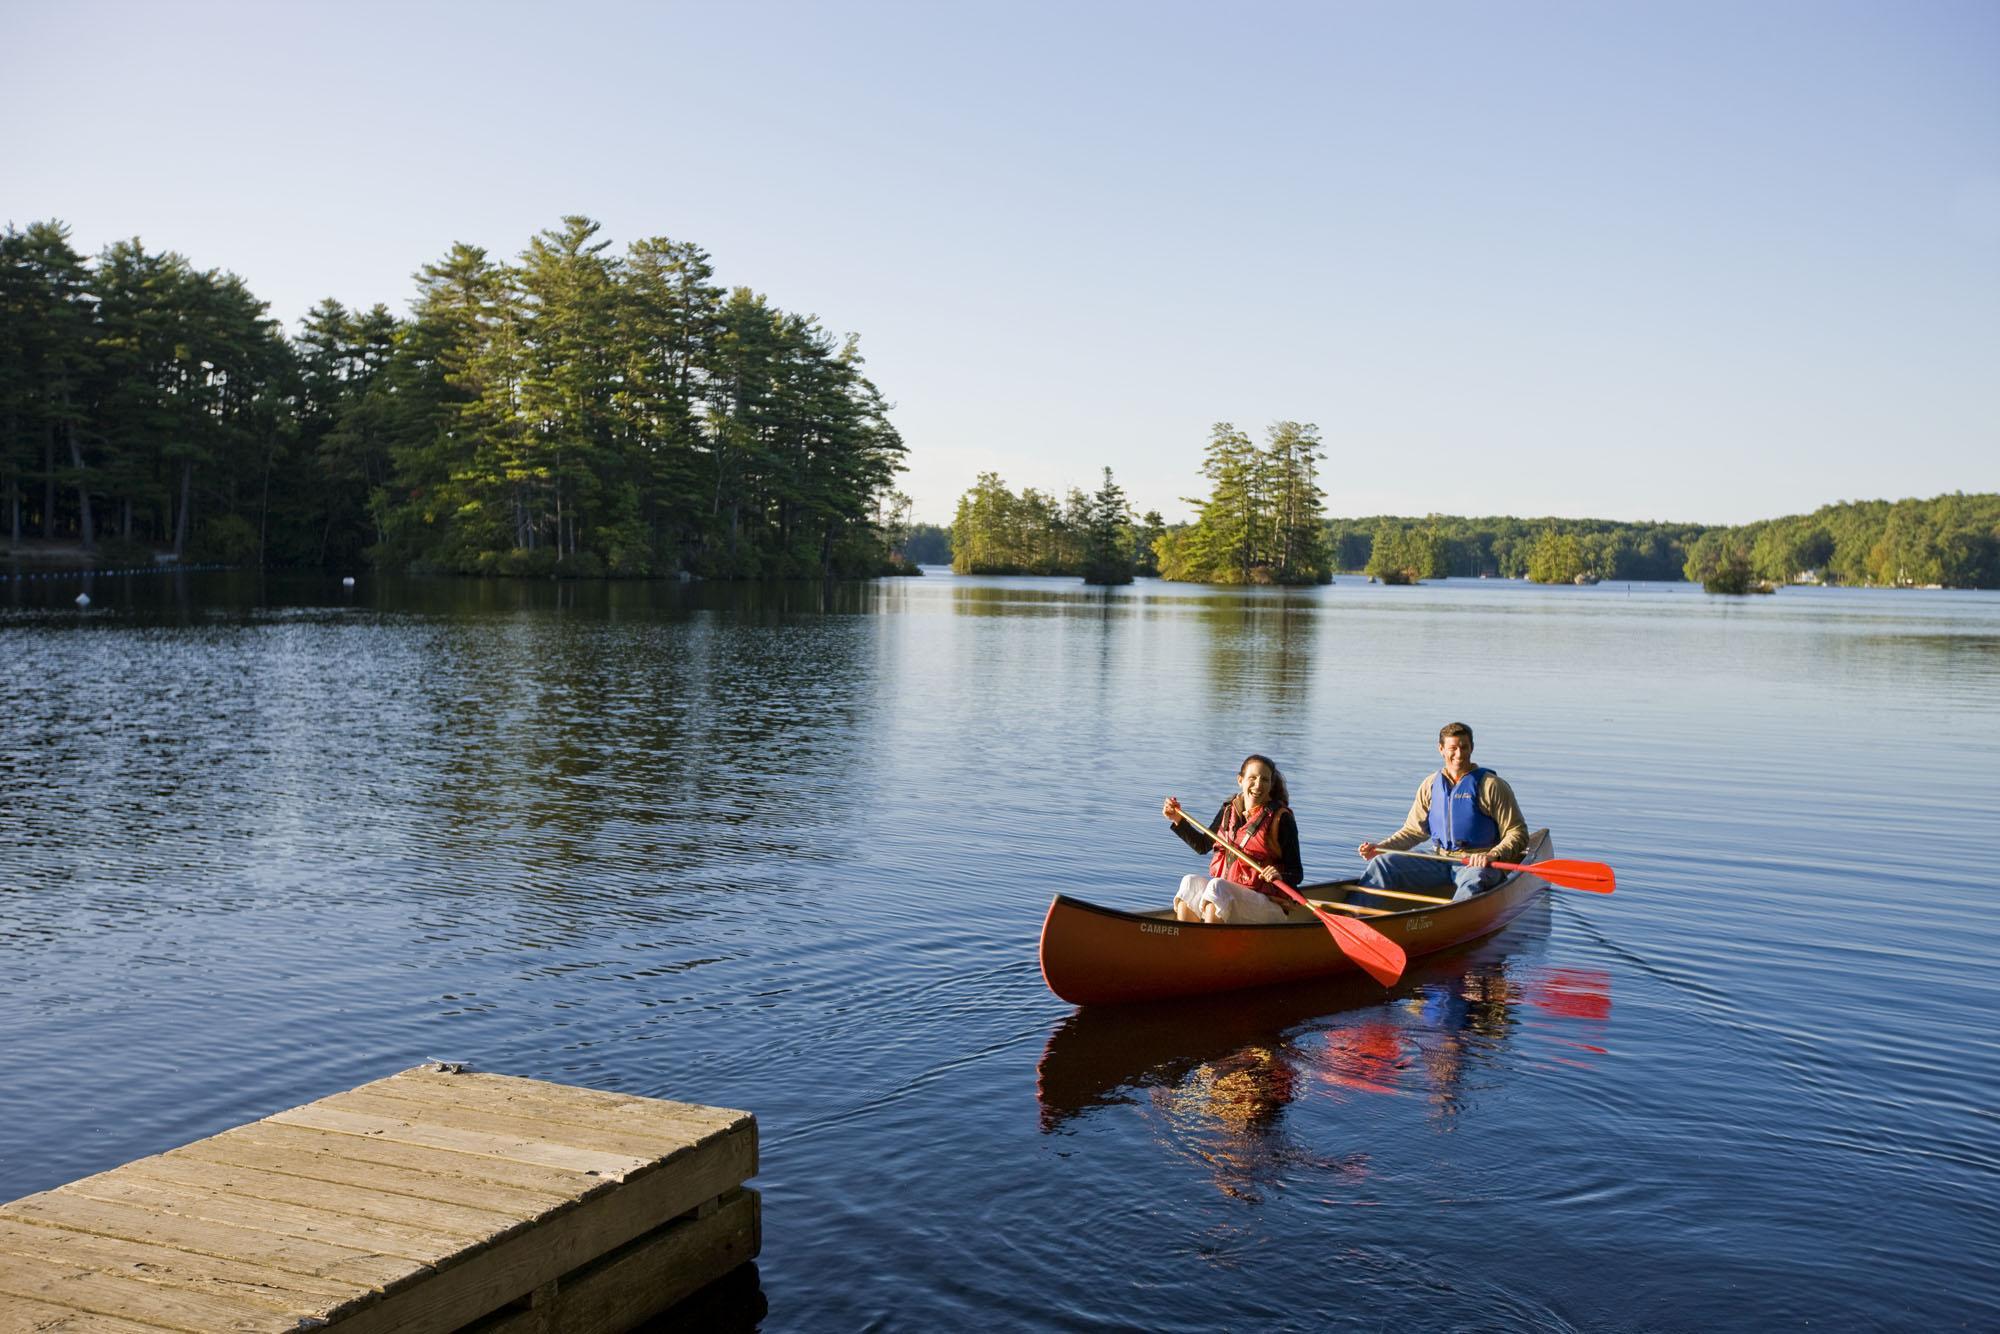 New England Family Spring Break Ideas | Inns and Resorts